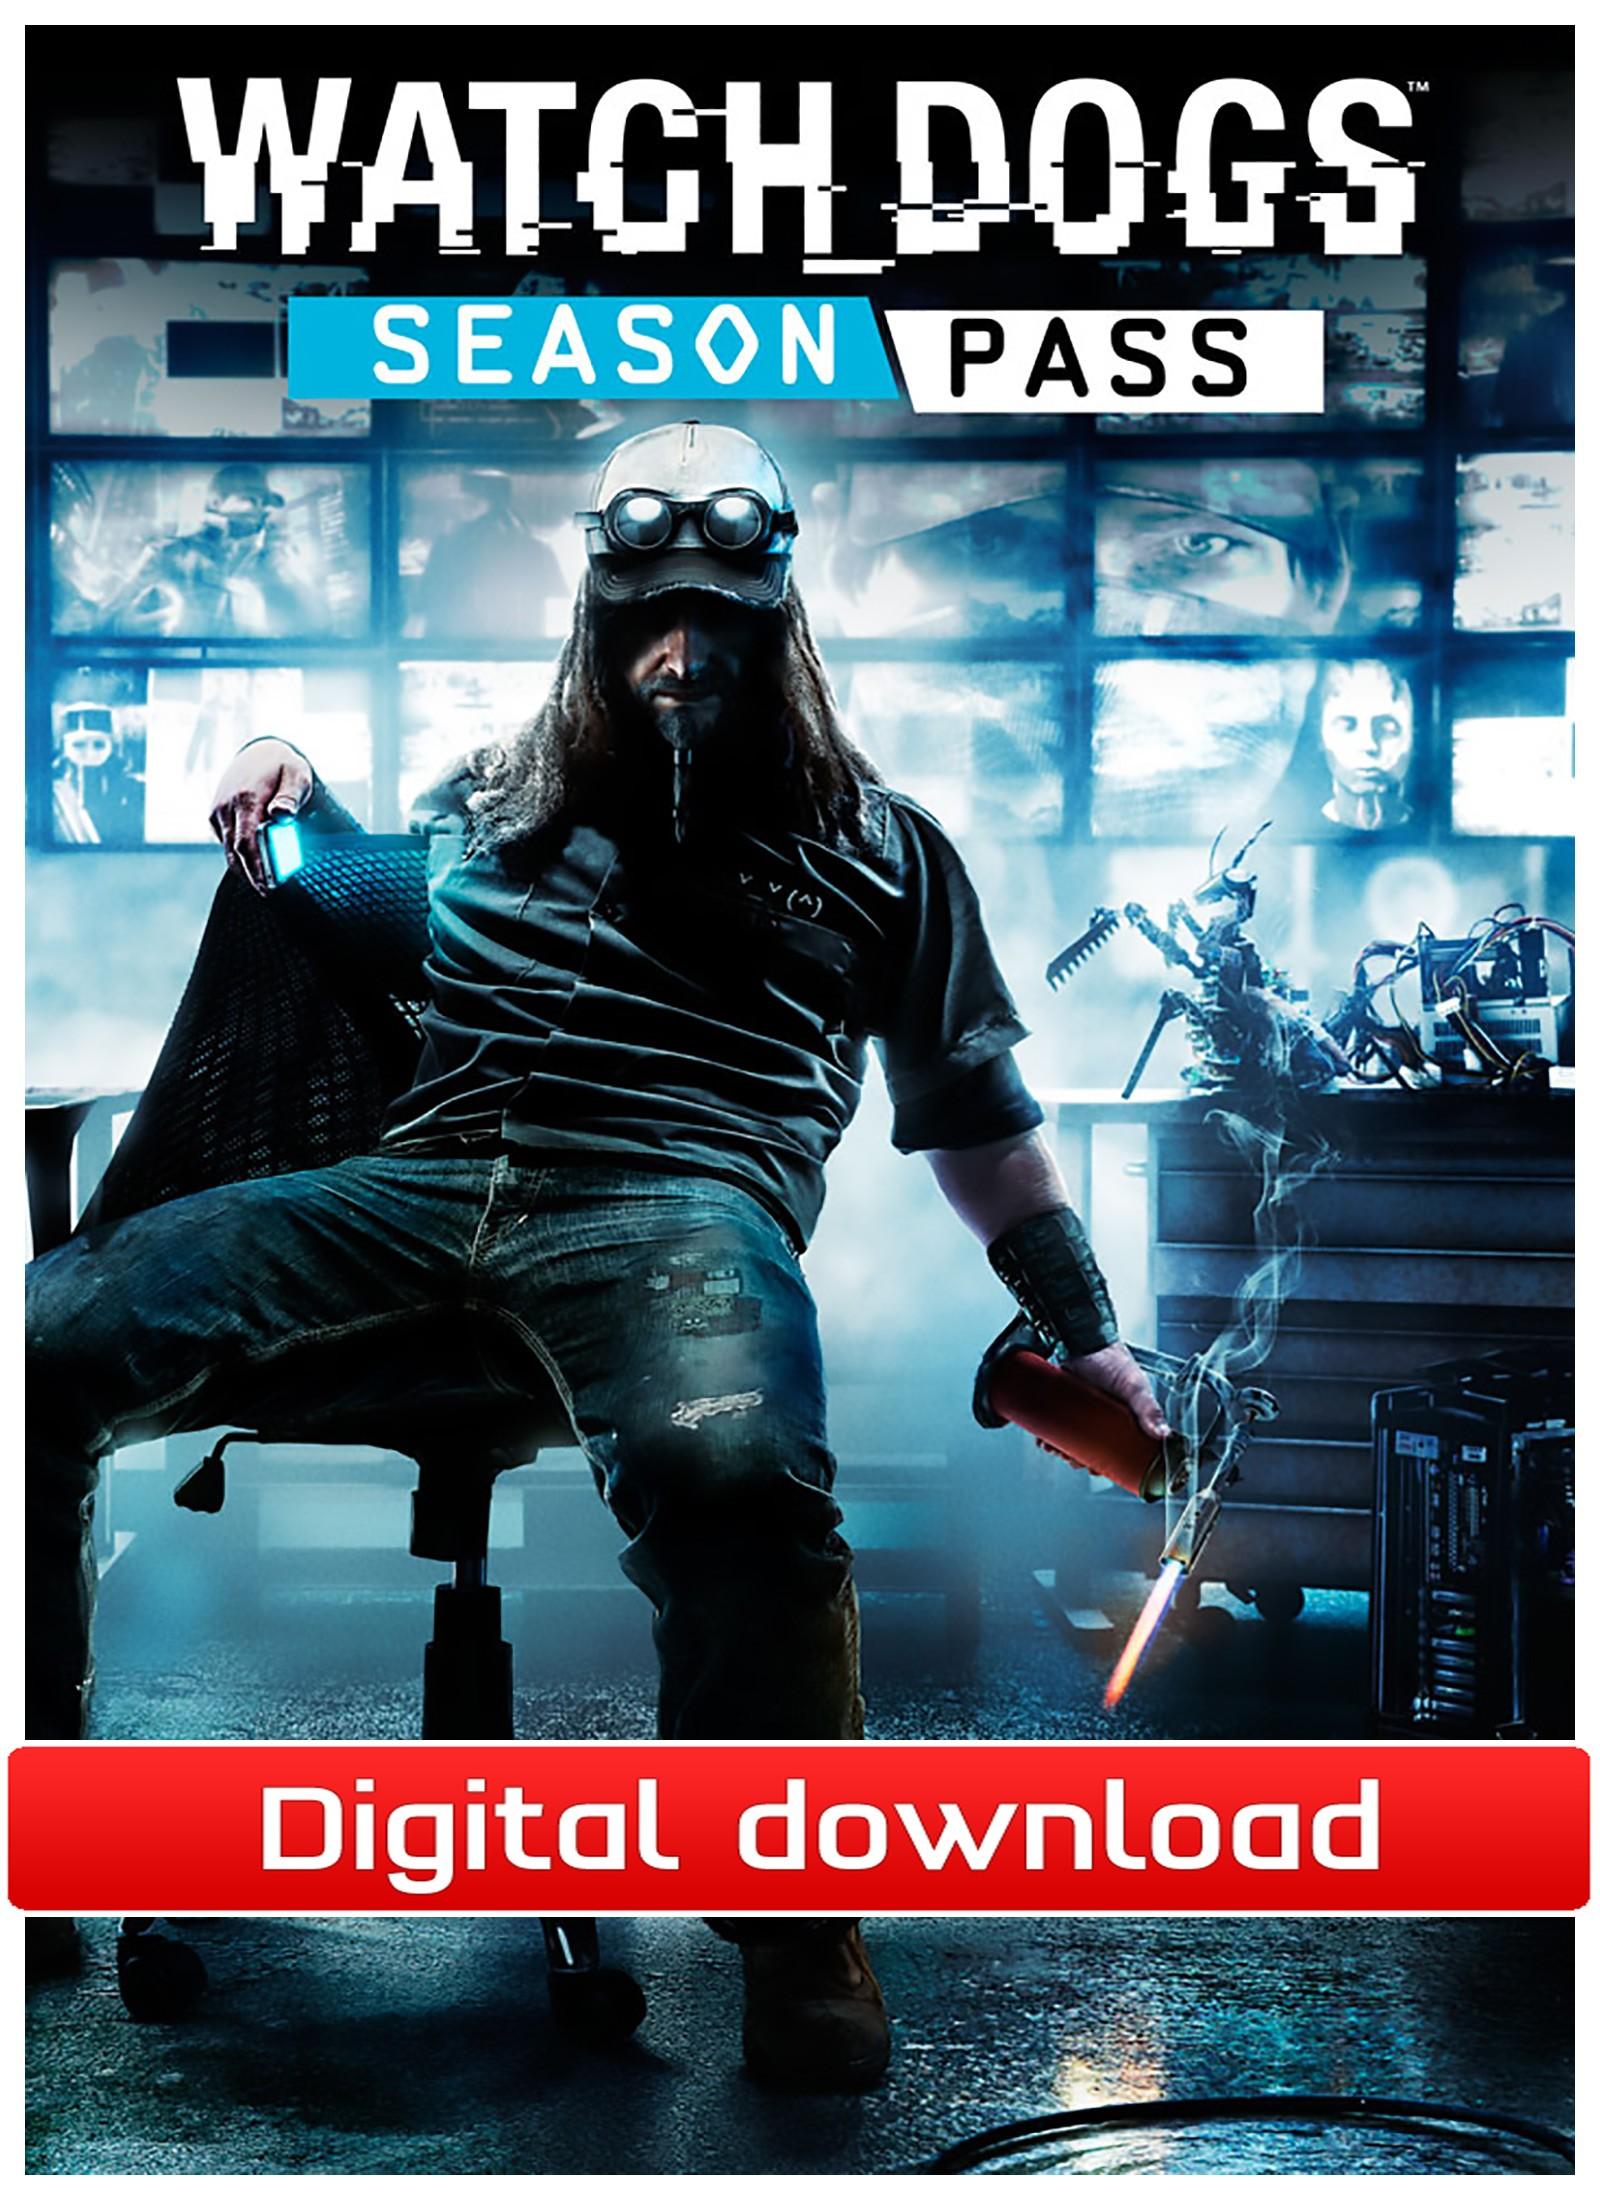 Watch Dogs: Season Pass (PC nedlastning) PCDD34039